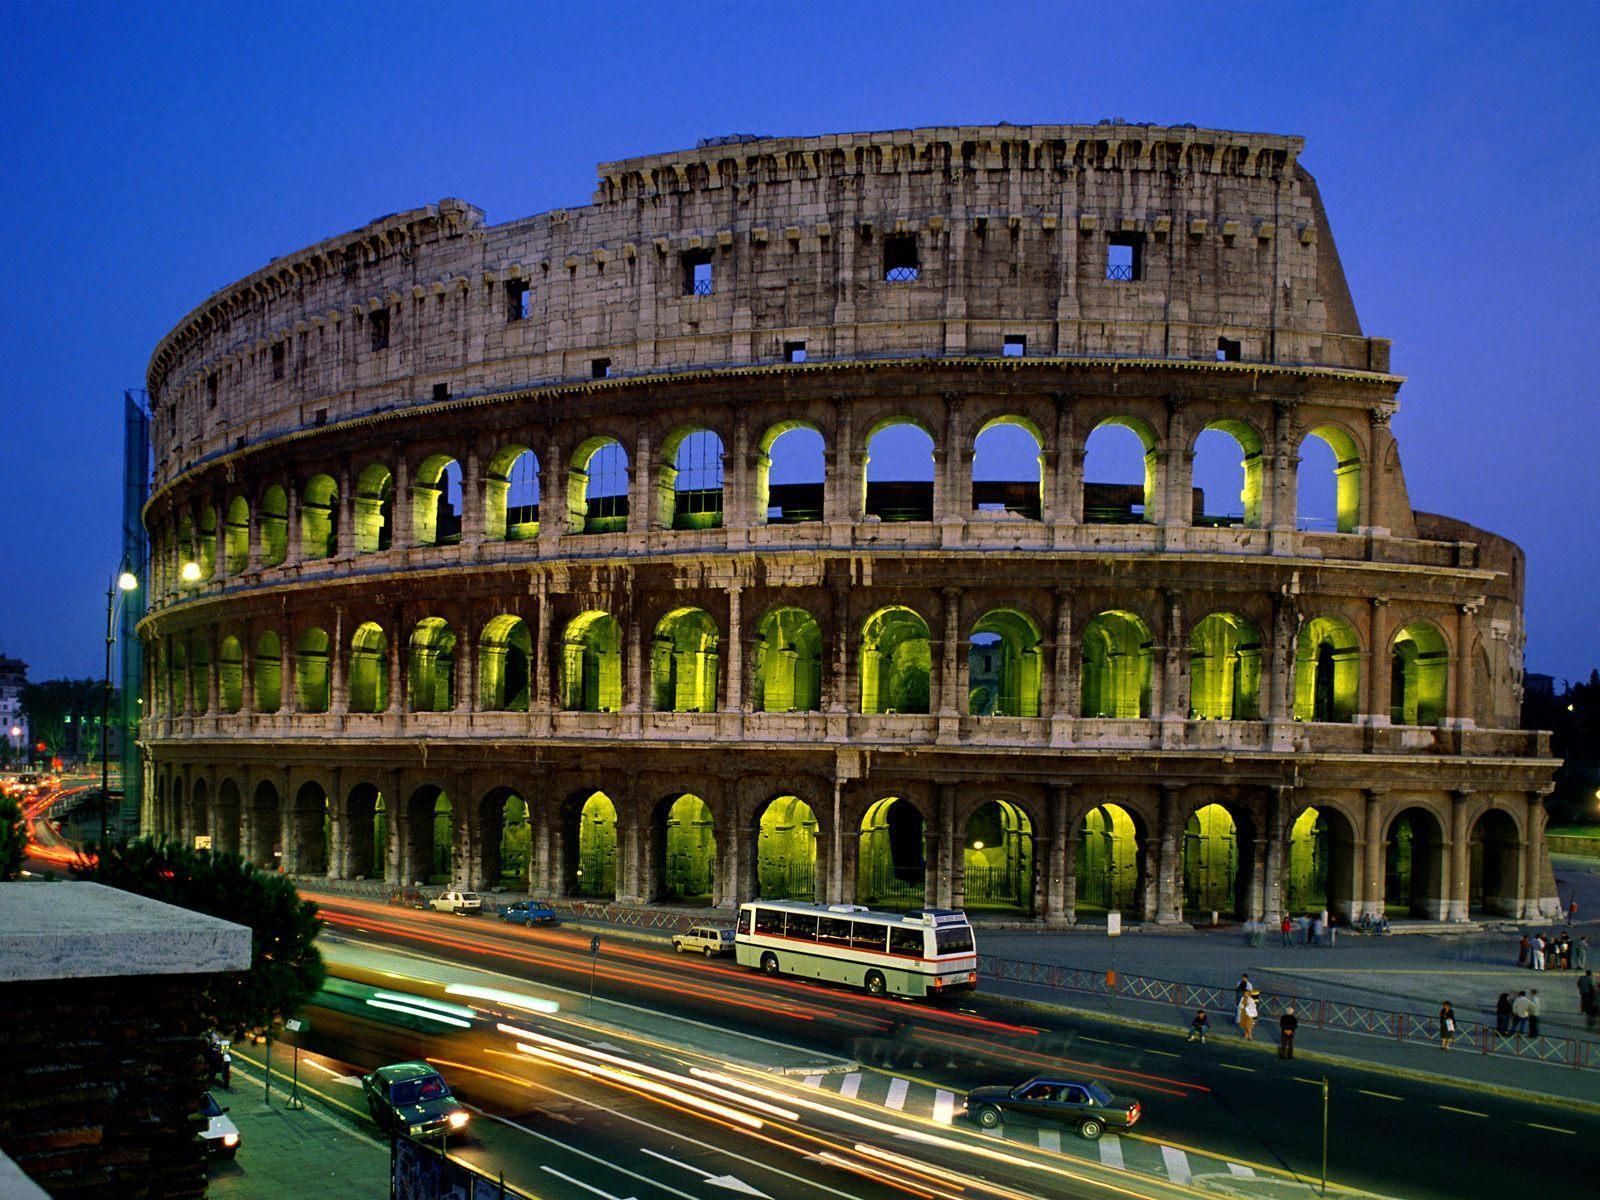 Coliseum Roma Architecture Desktop Wallpaper # #14670 Wallpaper ...